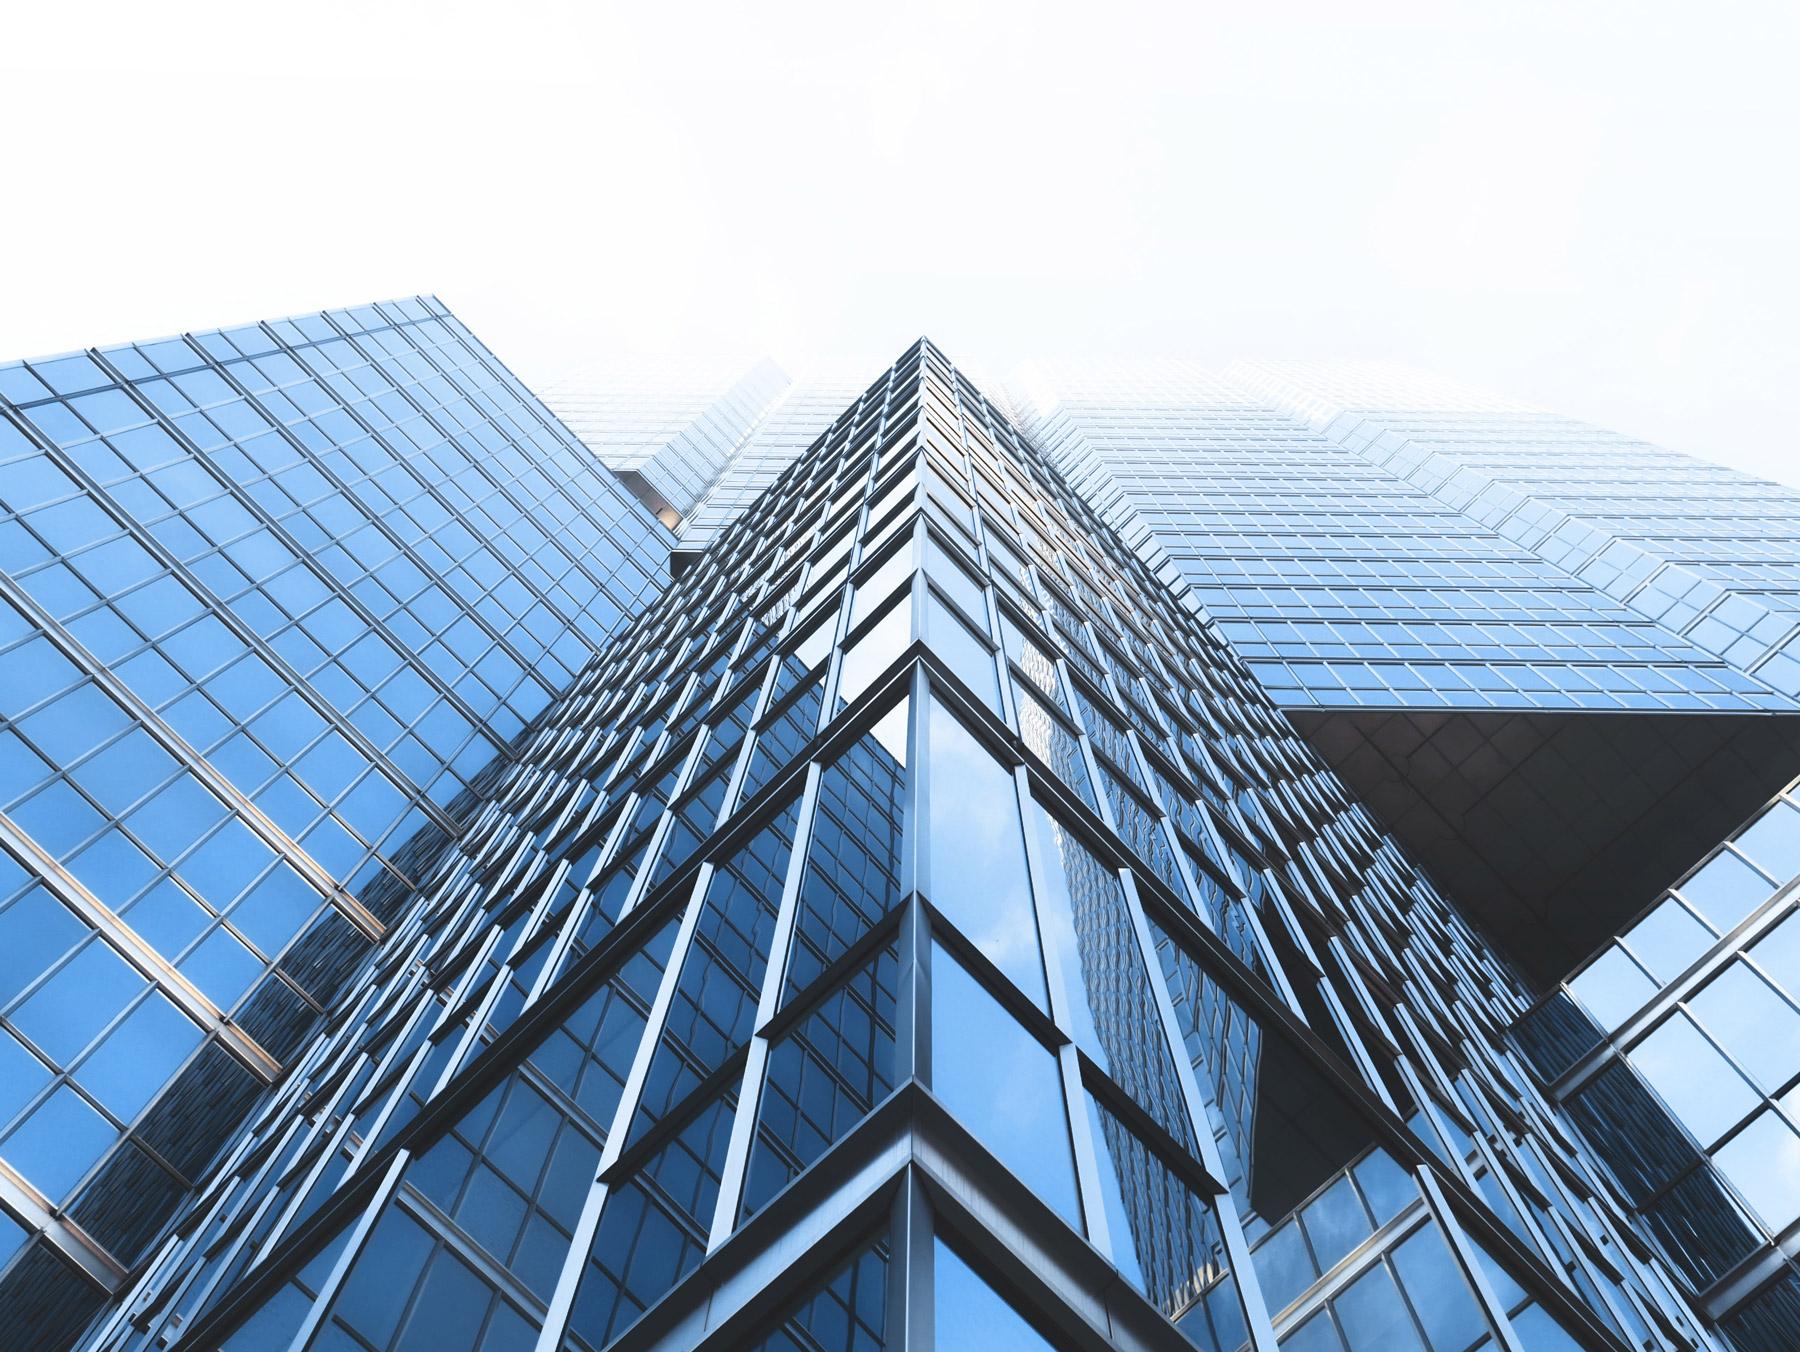 glass-glazed-wall-high-end-montreal-vitrerie-jl